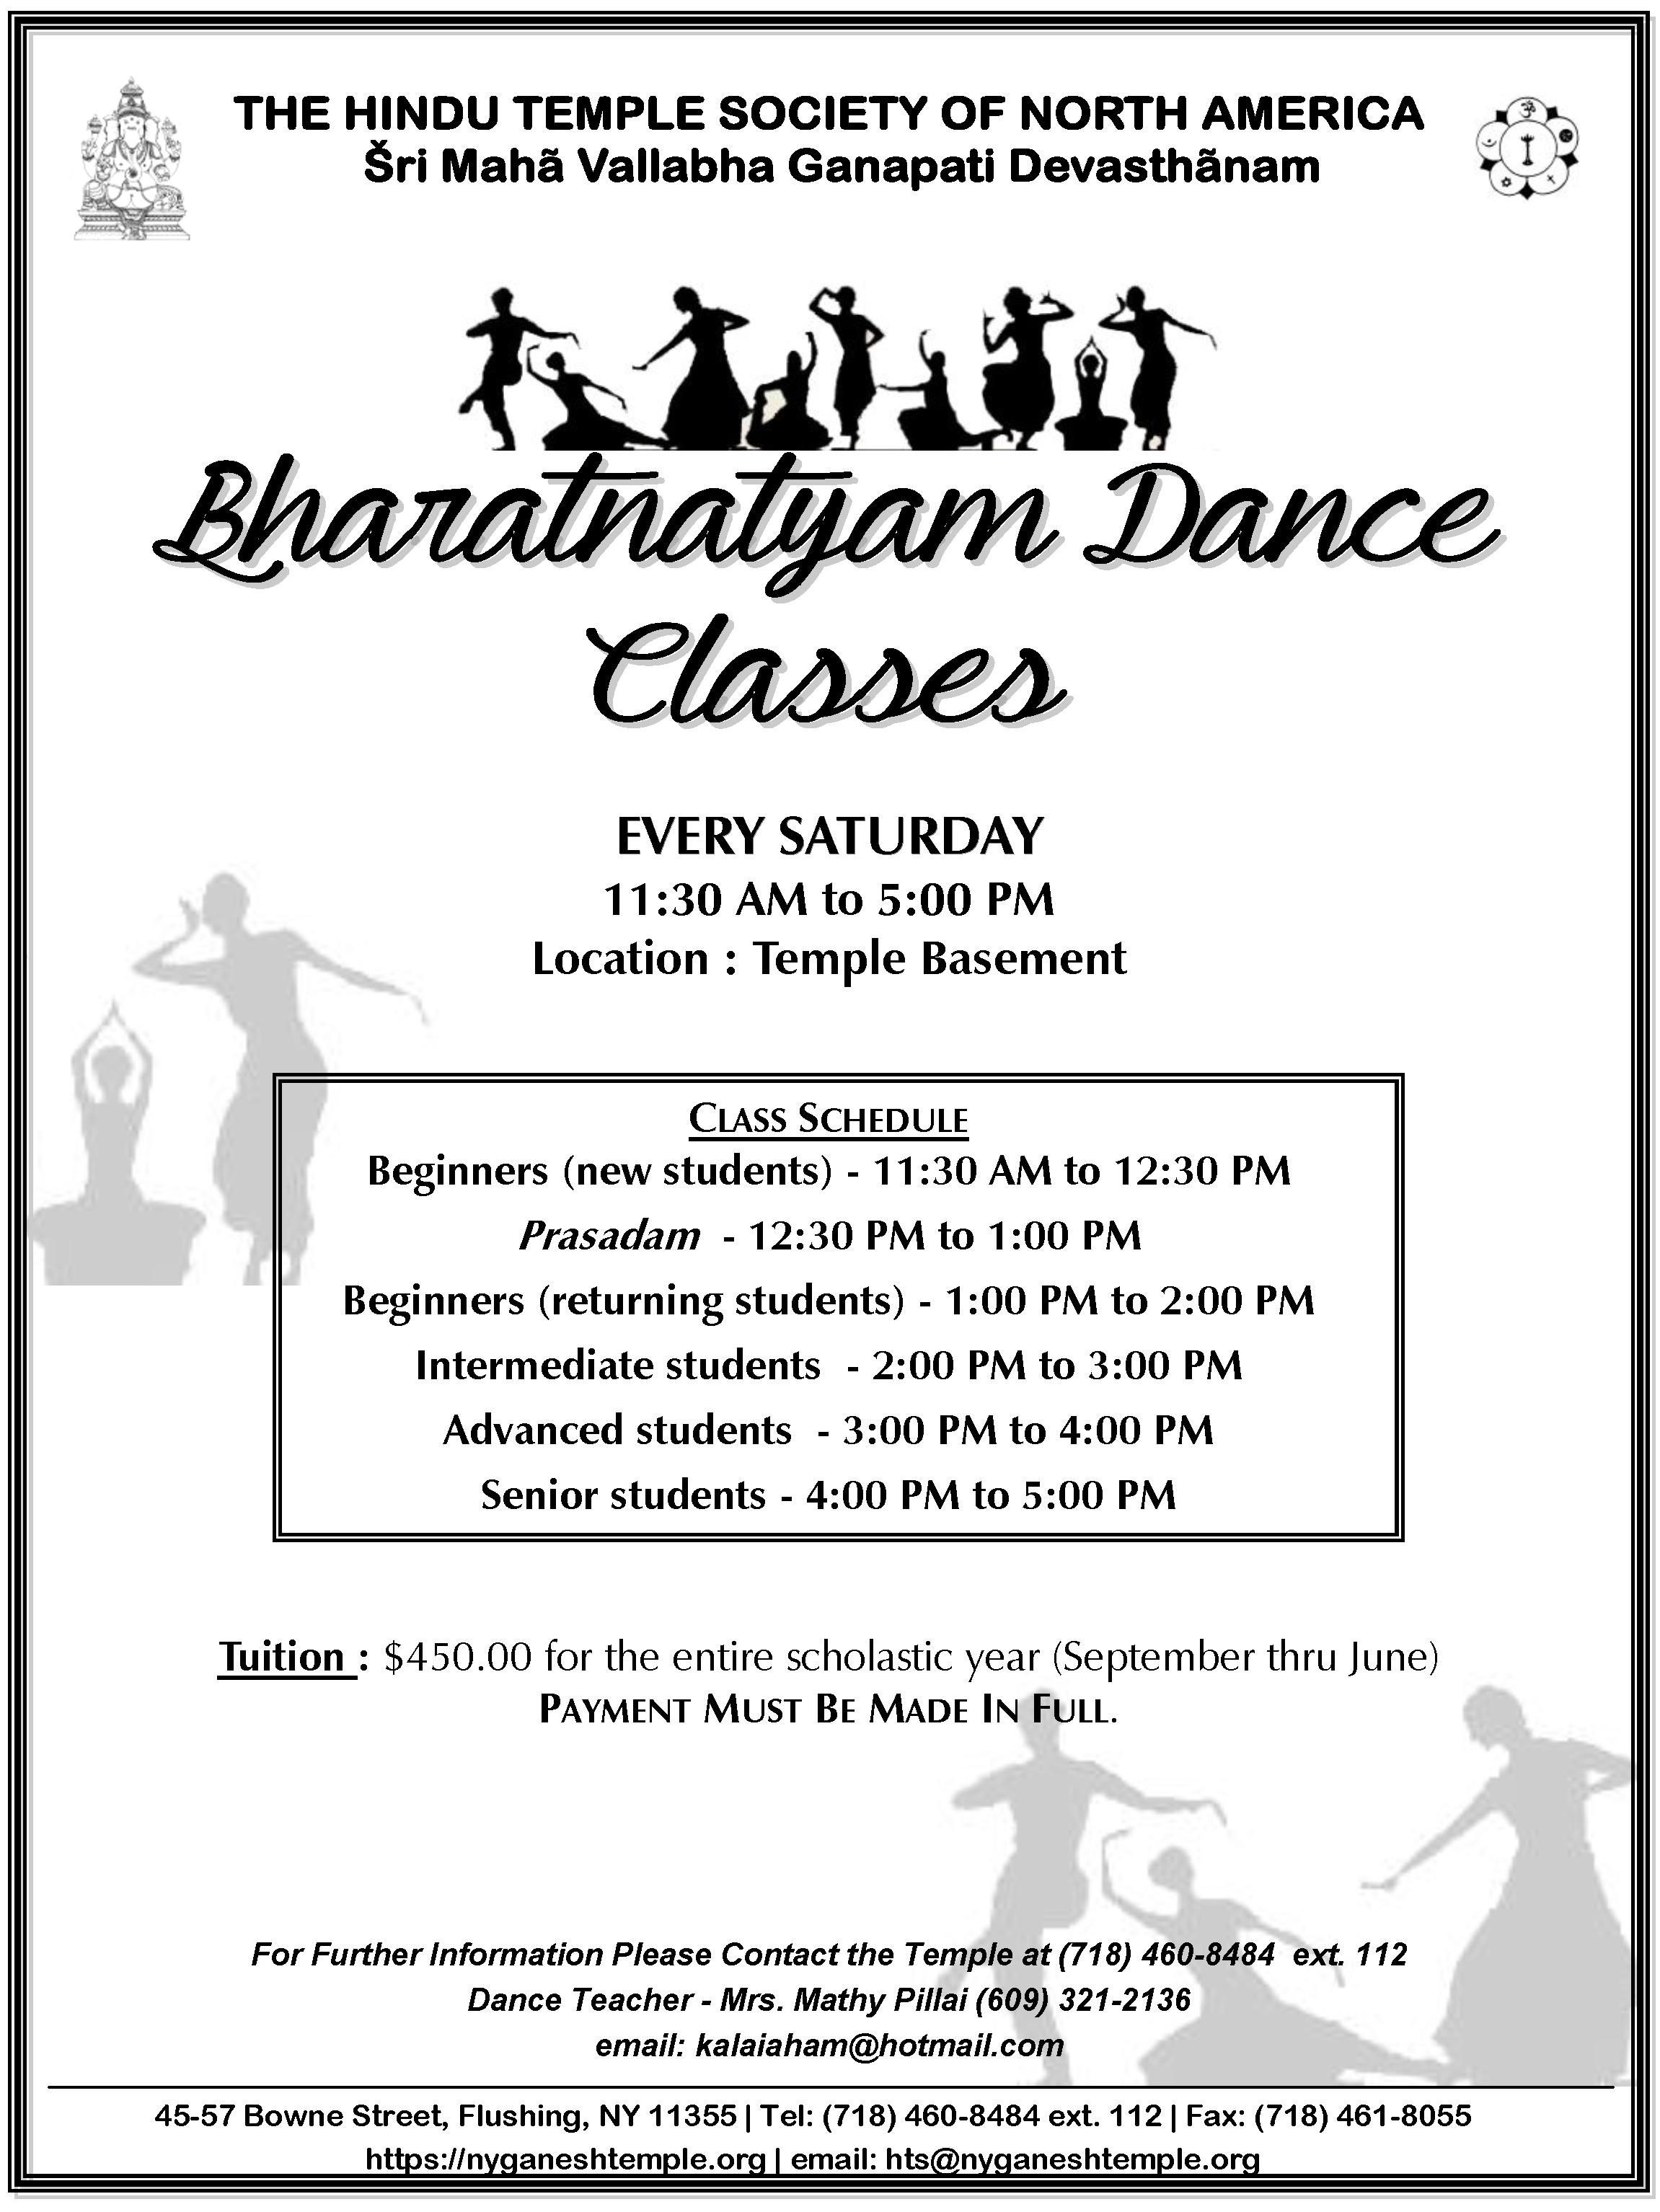 bharatnatyam-dance-classes16_page_1